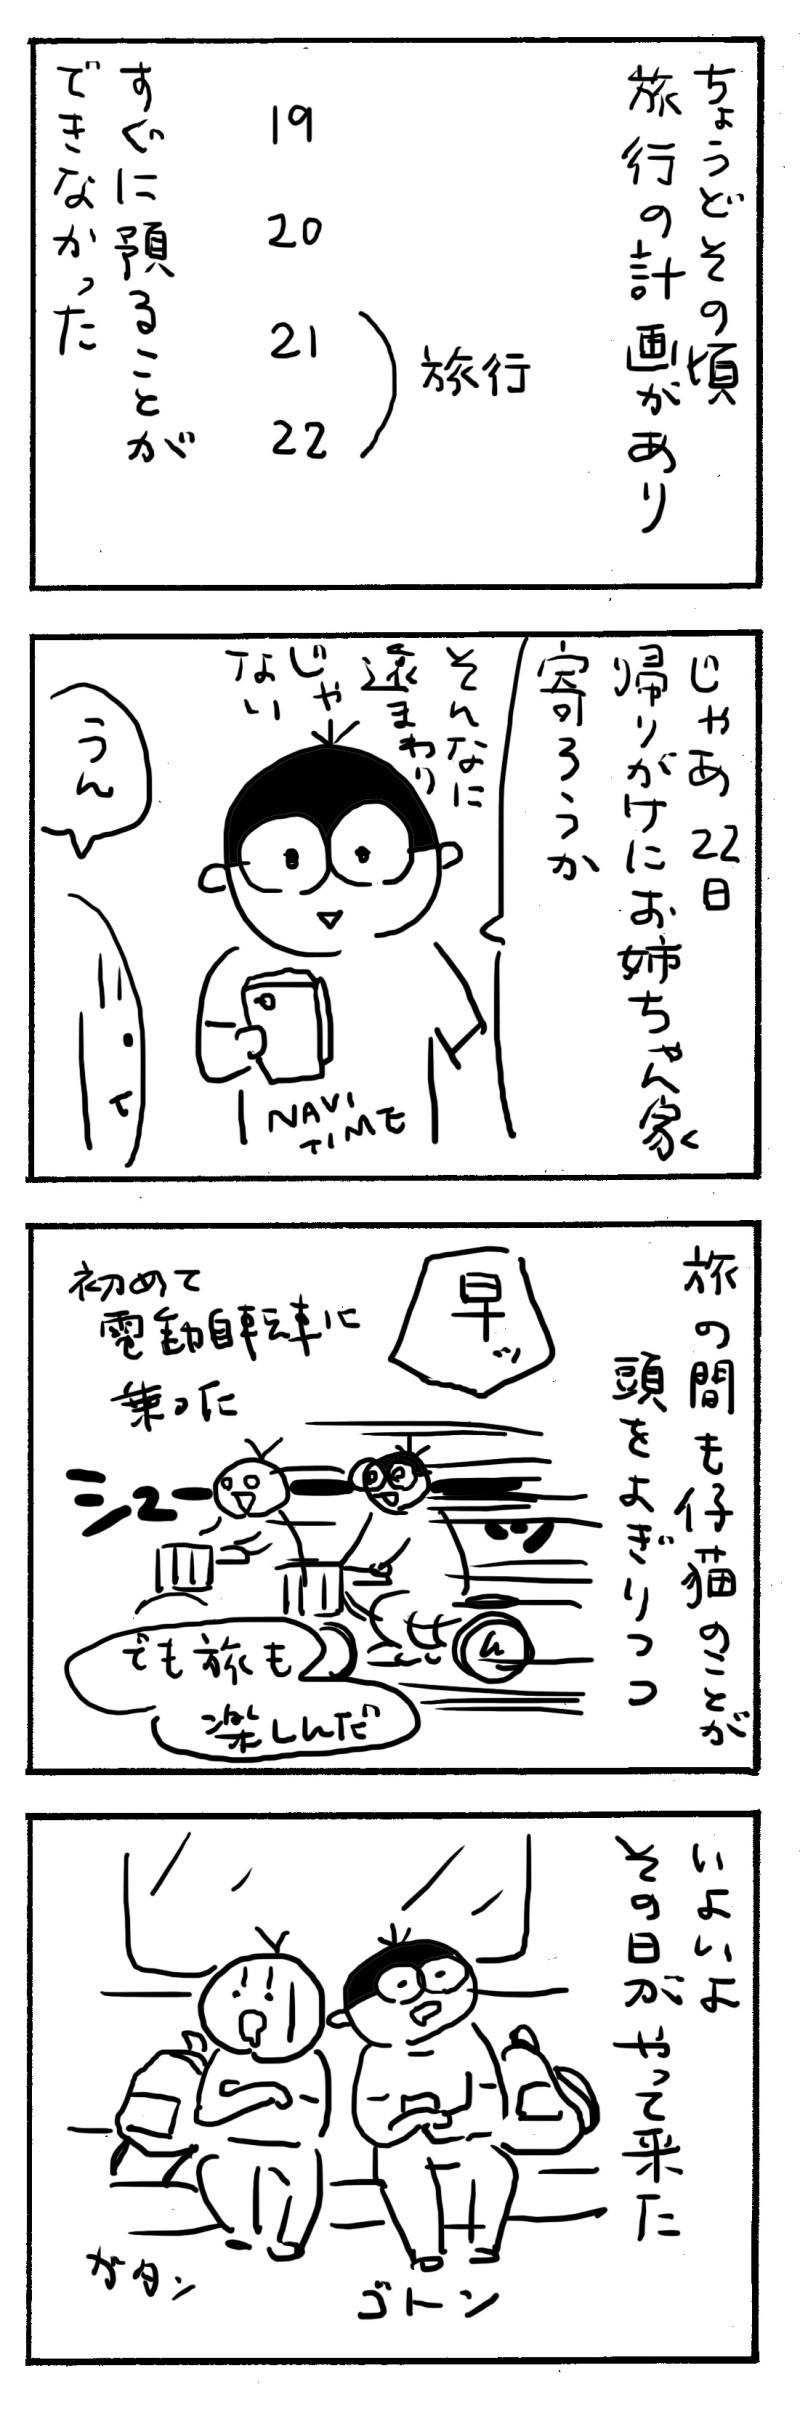 3b1c4075.jpg